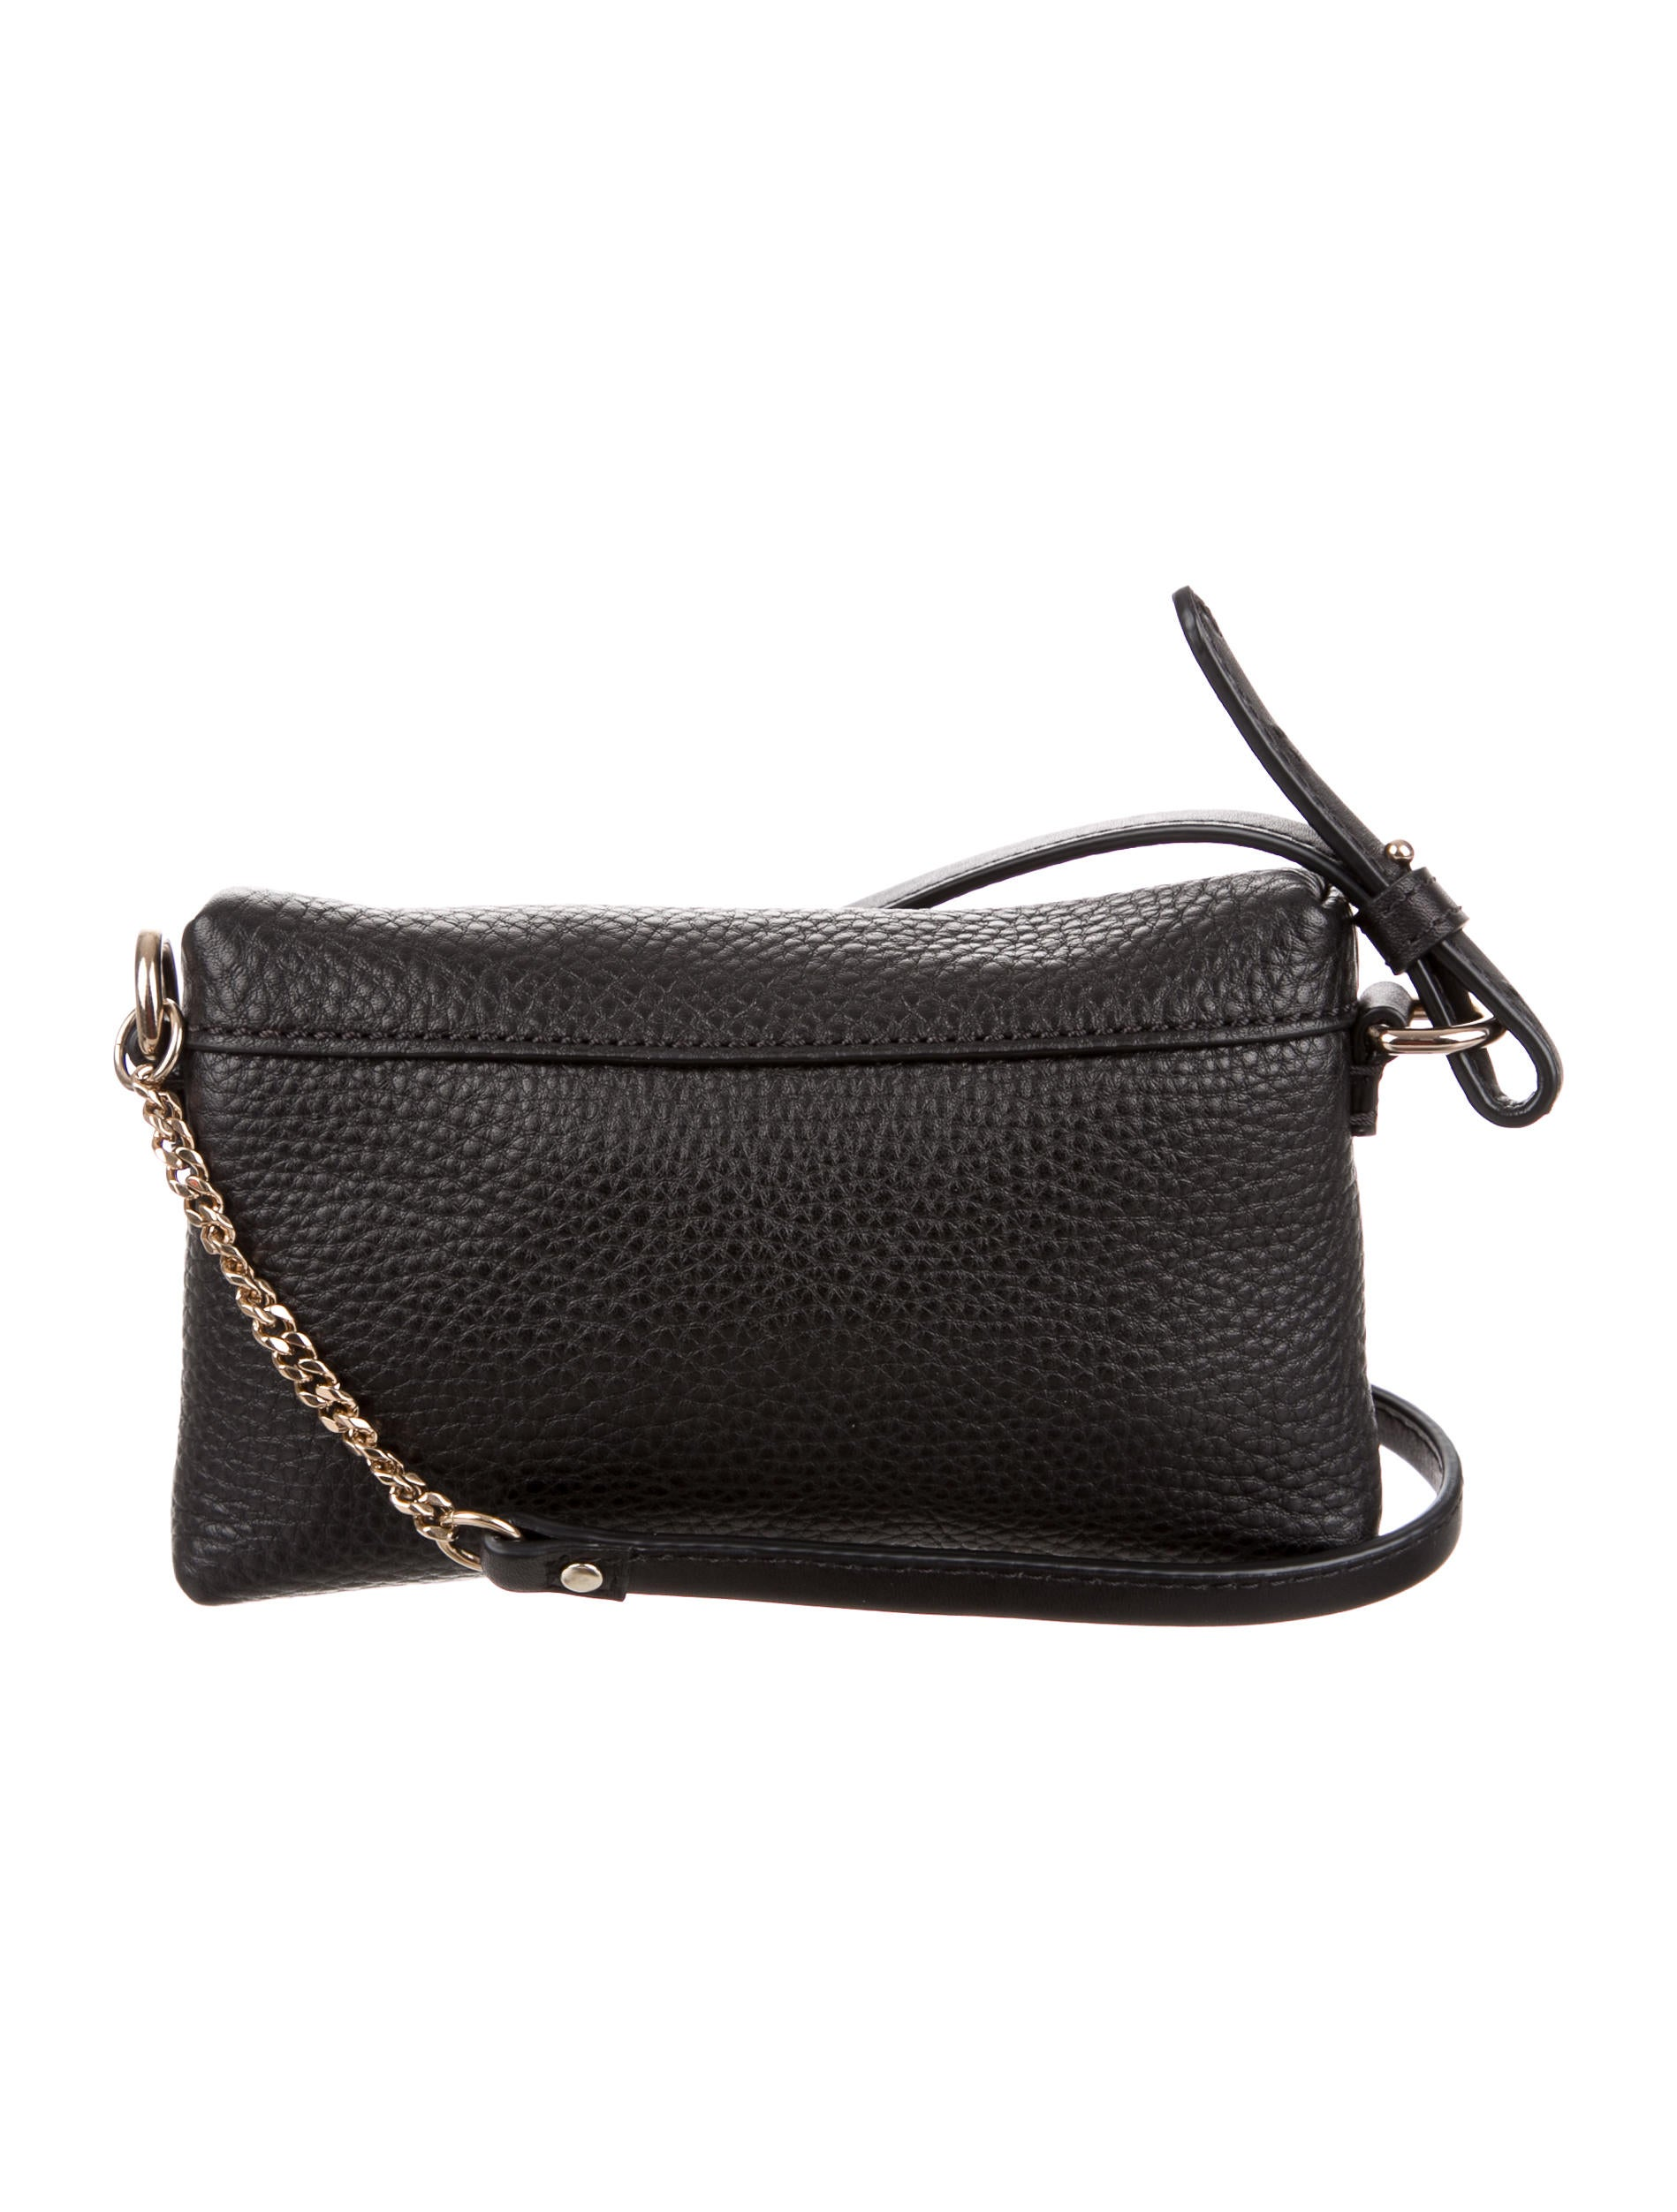 Black Pebbled Leather Crossbody Bag 93